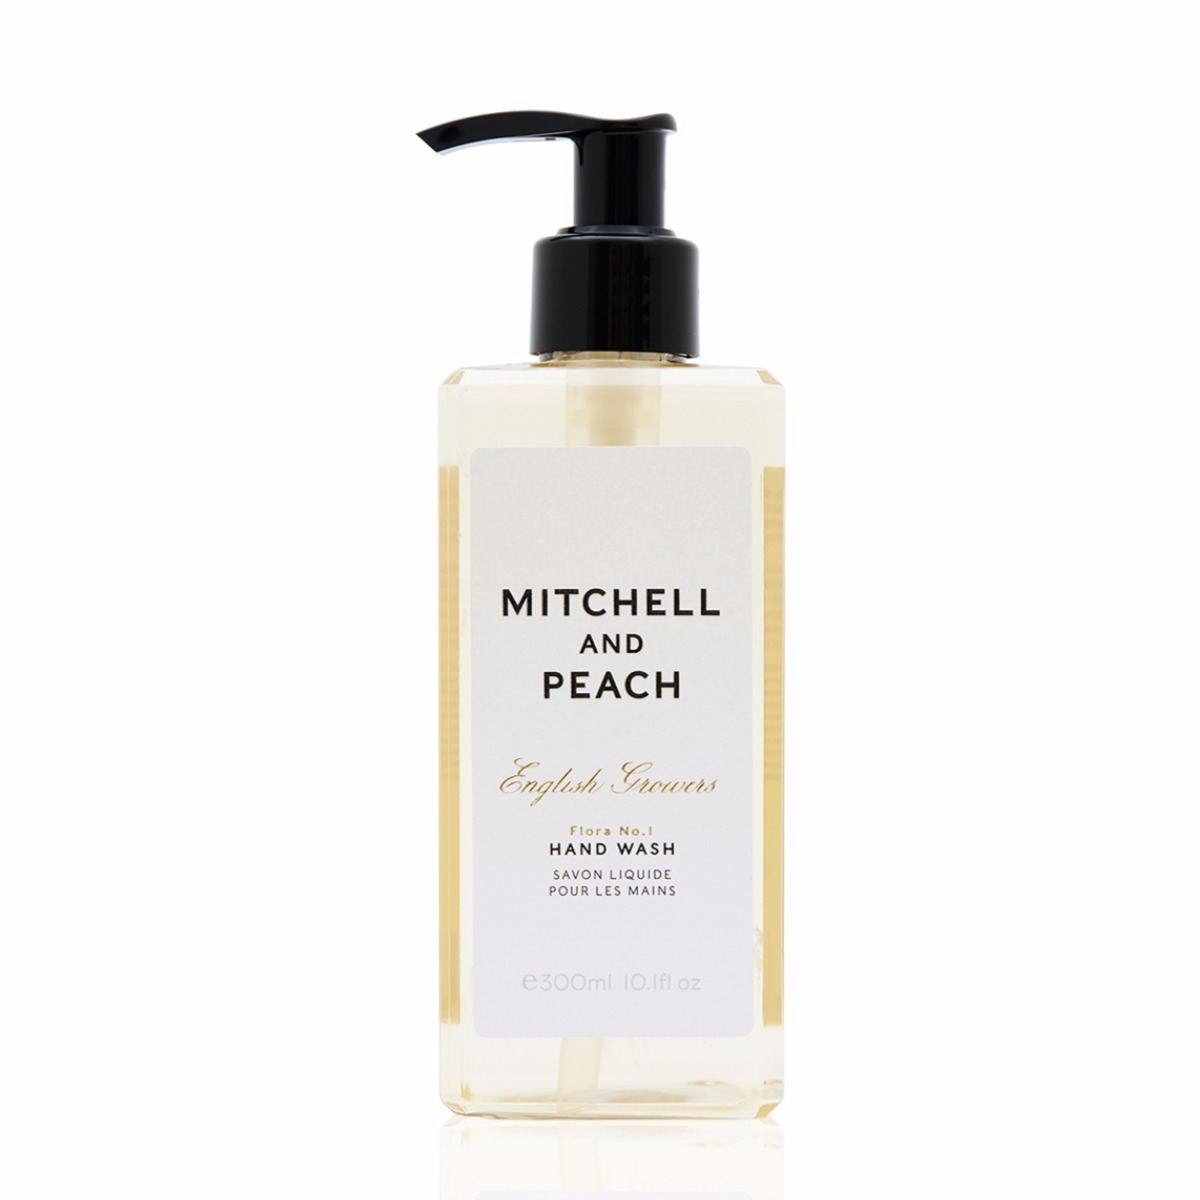 Mitchell and Peach Handwash